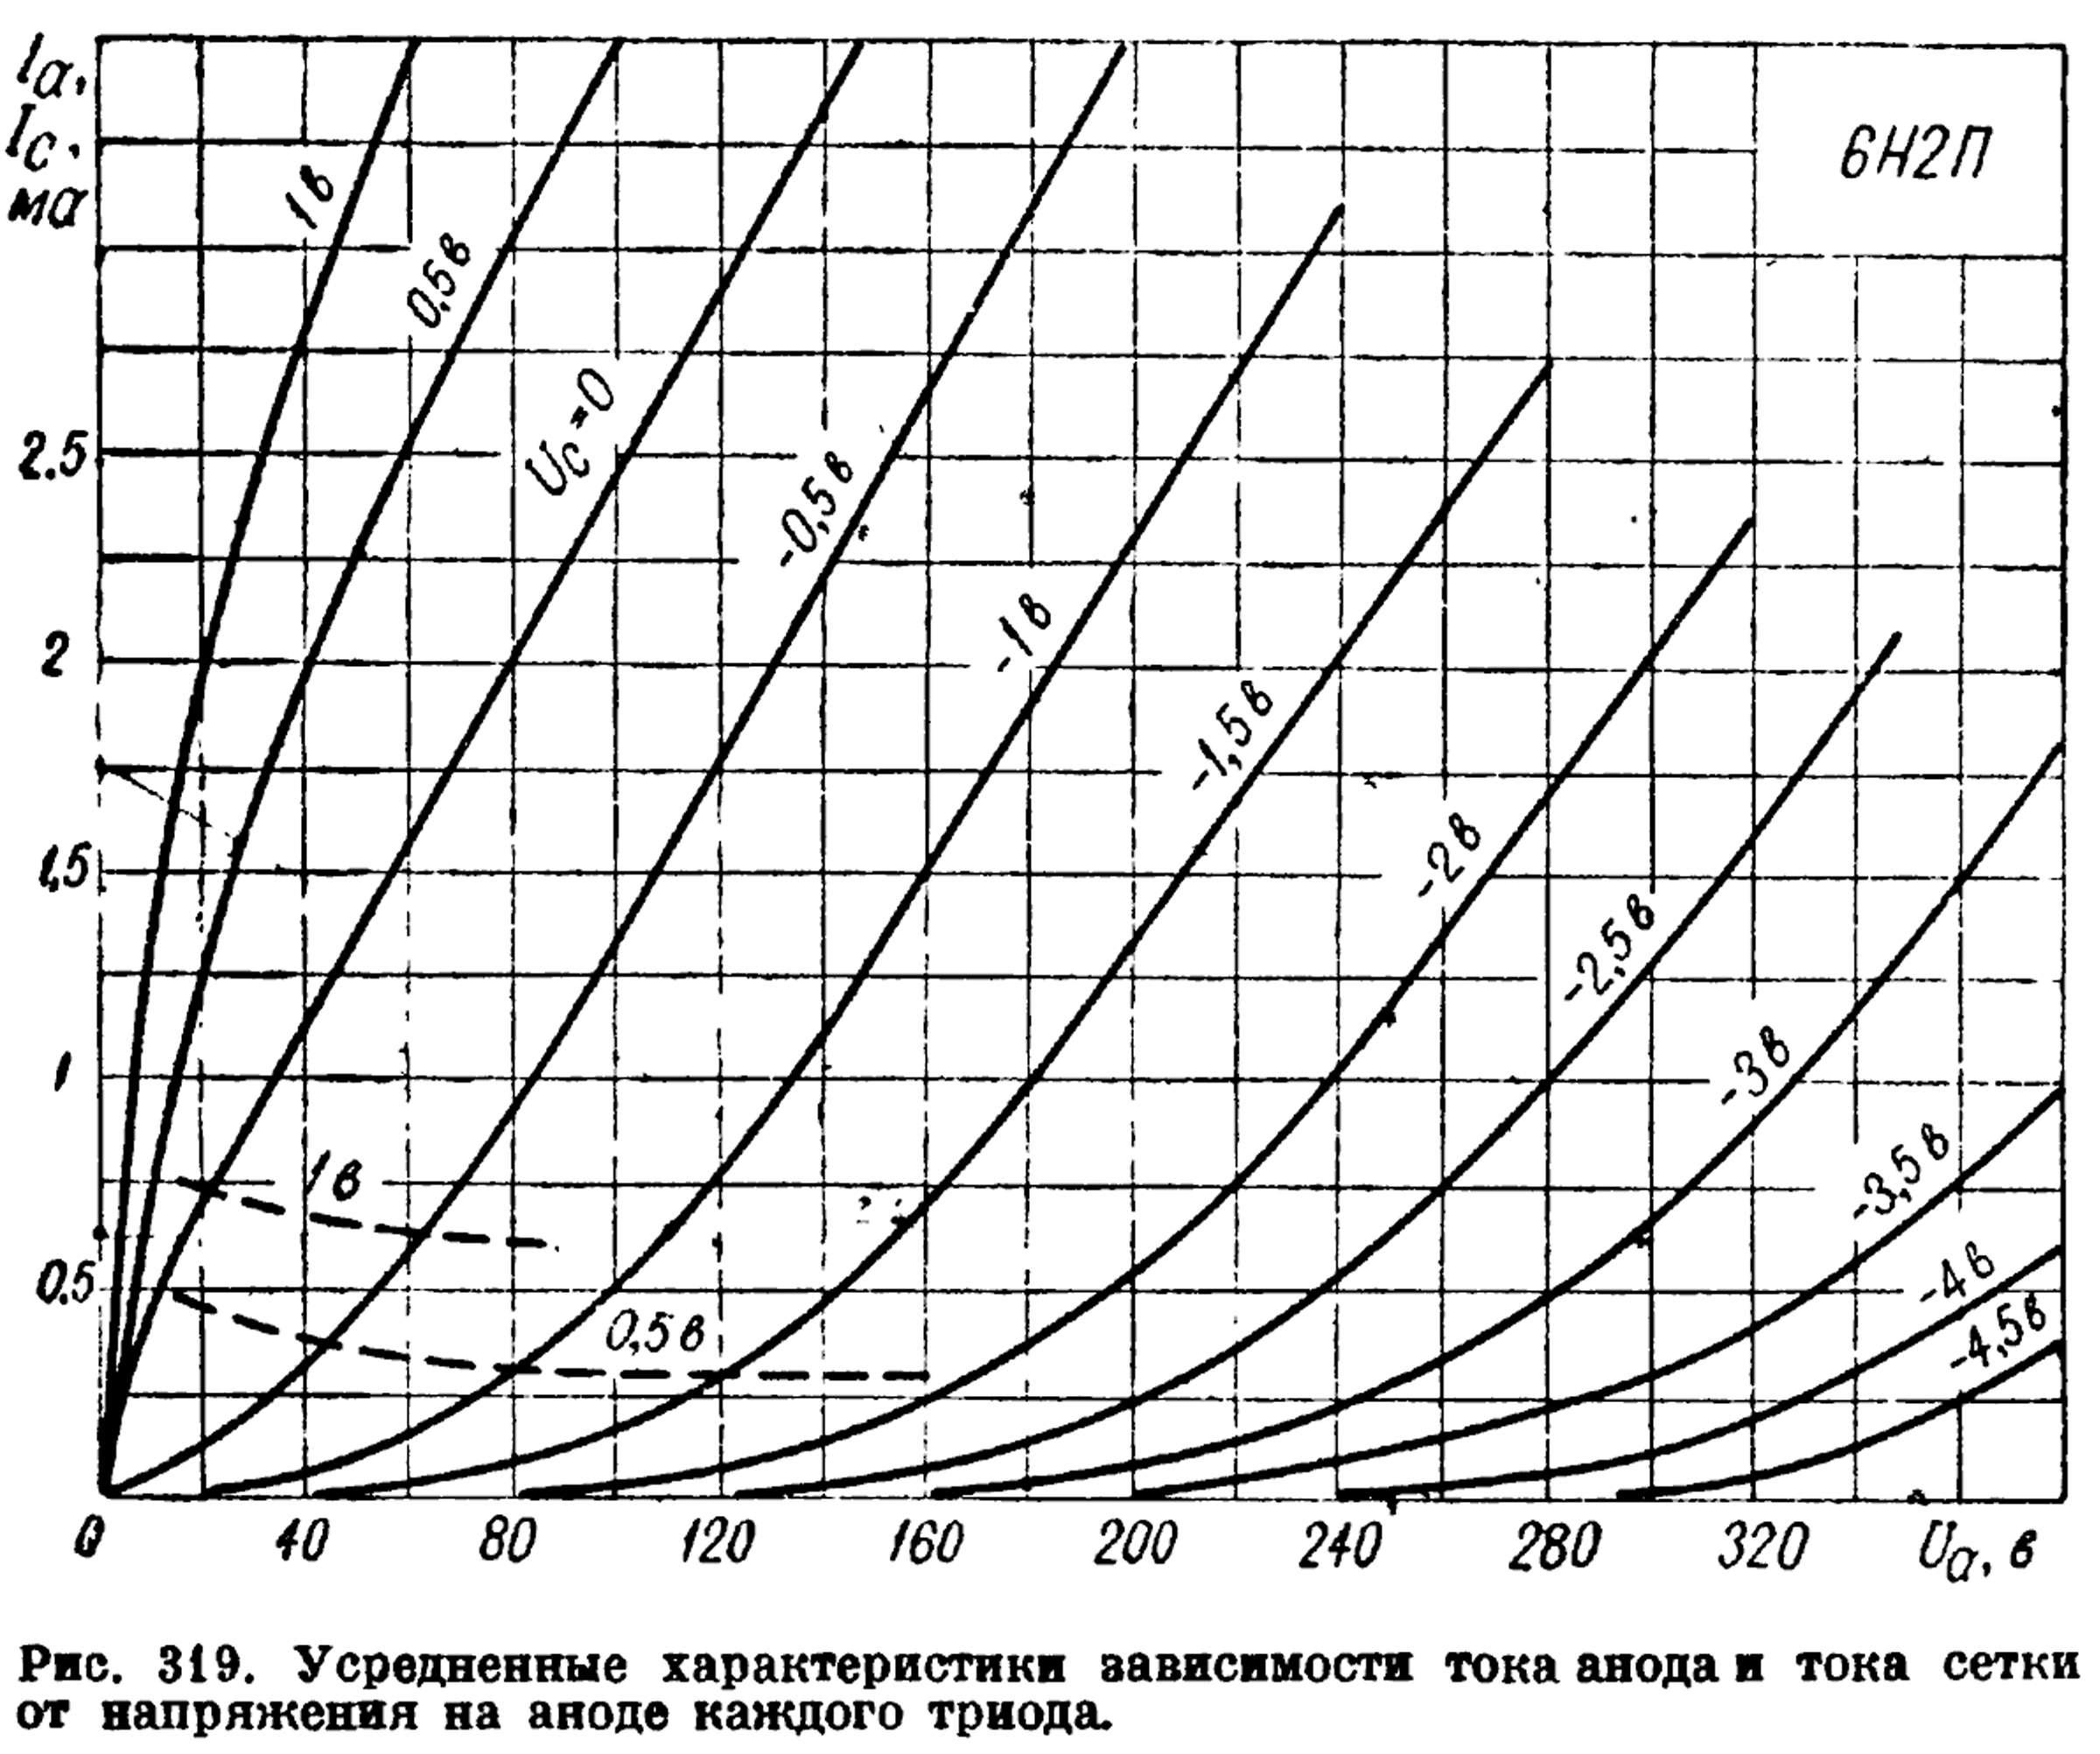 Параметры радиолампы 6Н2П